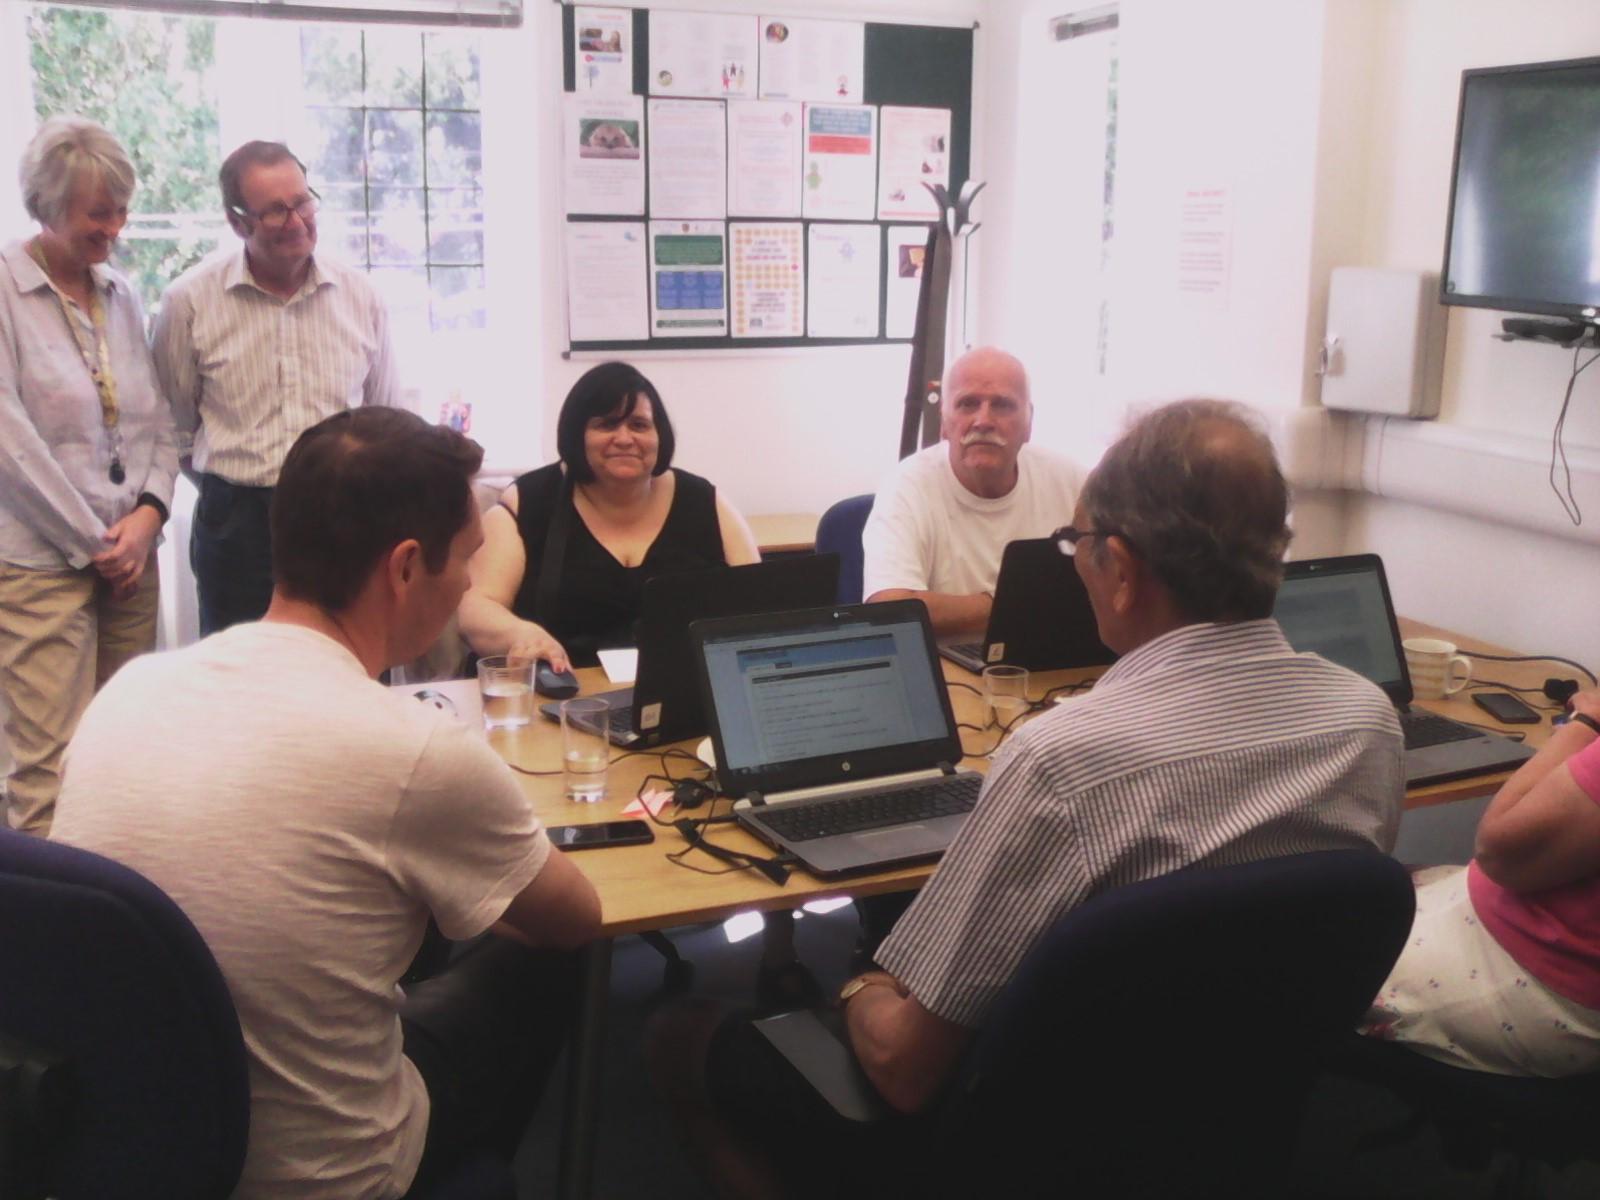 Coleshill Community Hub Computer Club